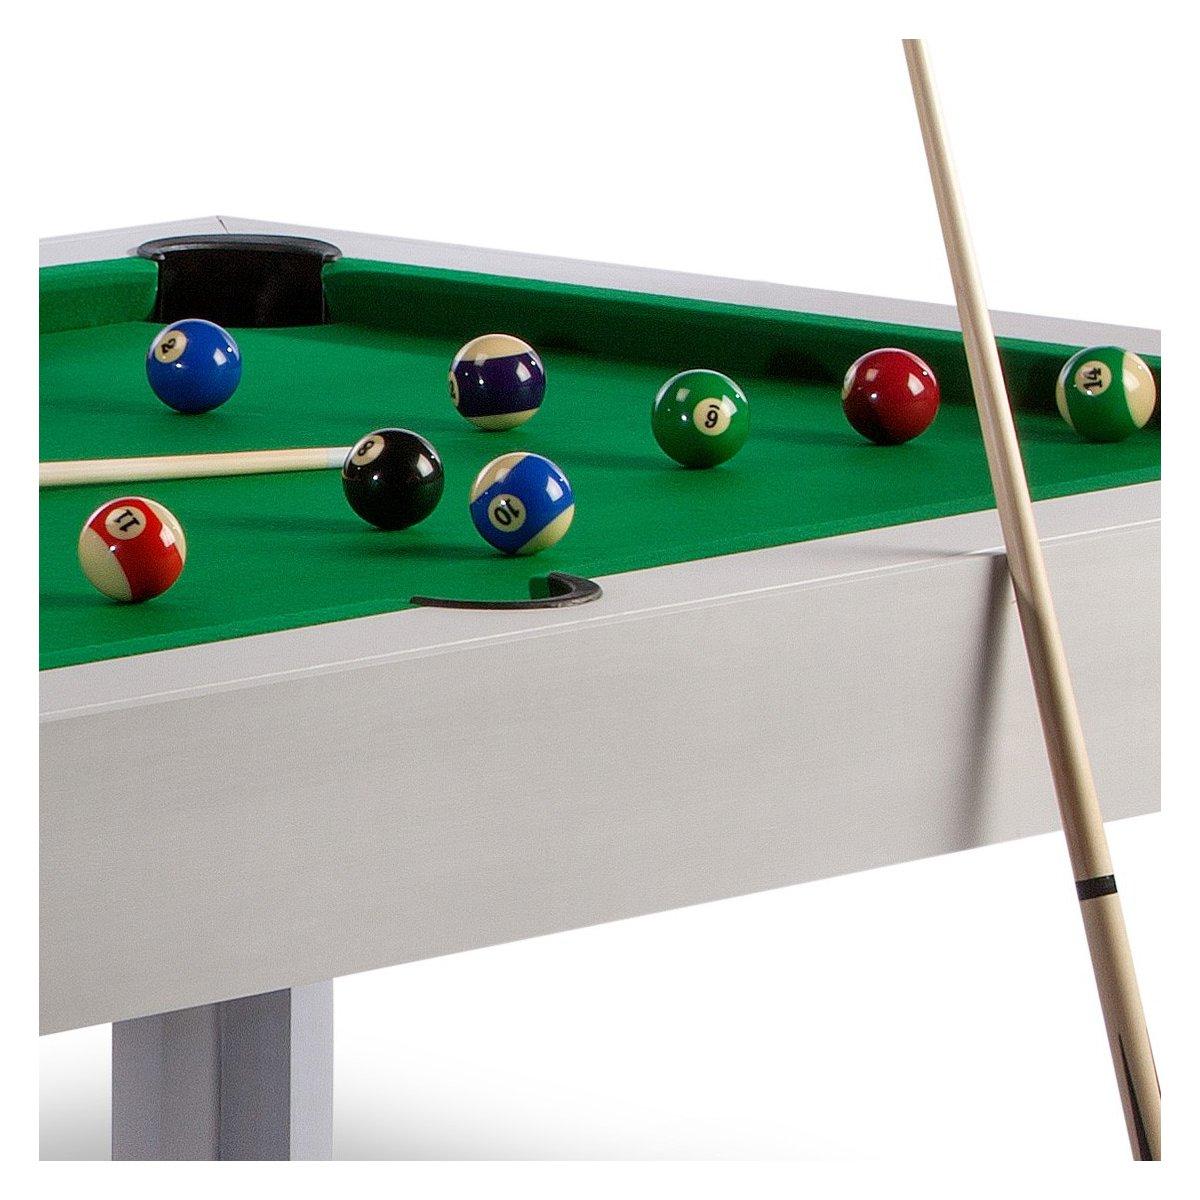 billard americain us pool discount transformable en table. Black Bedroom Furniture Sets. Home Design Ideas